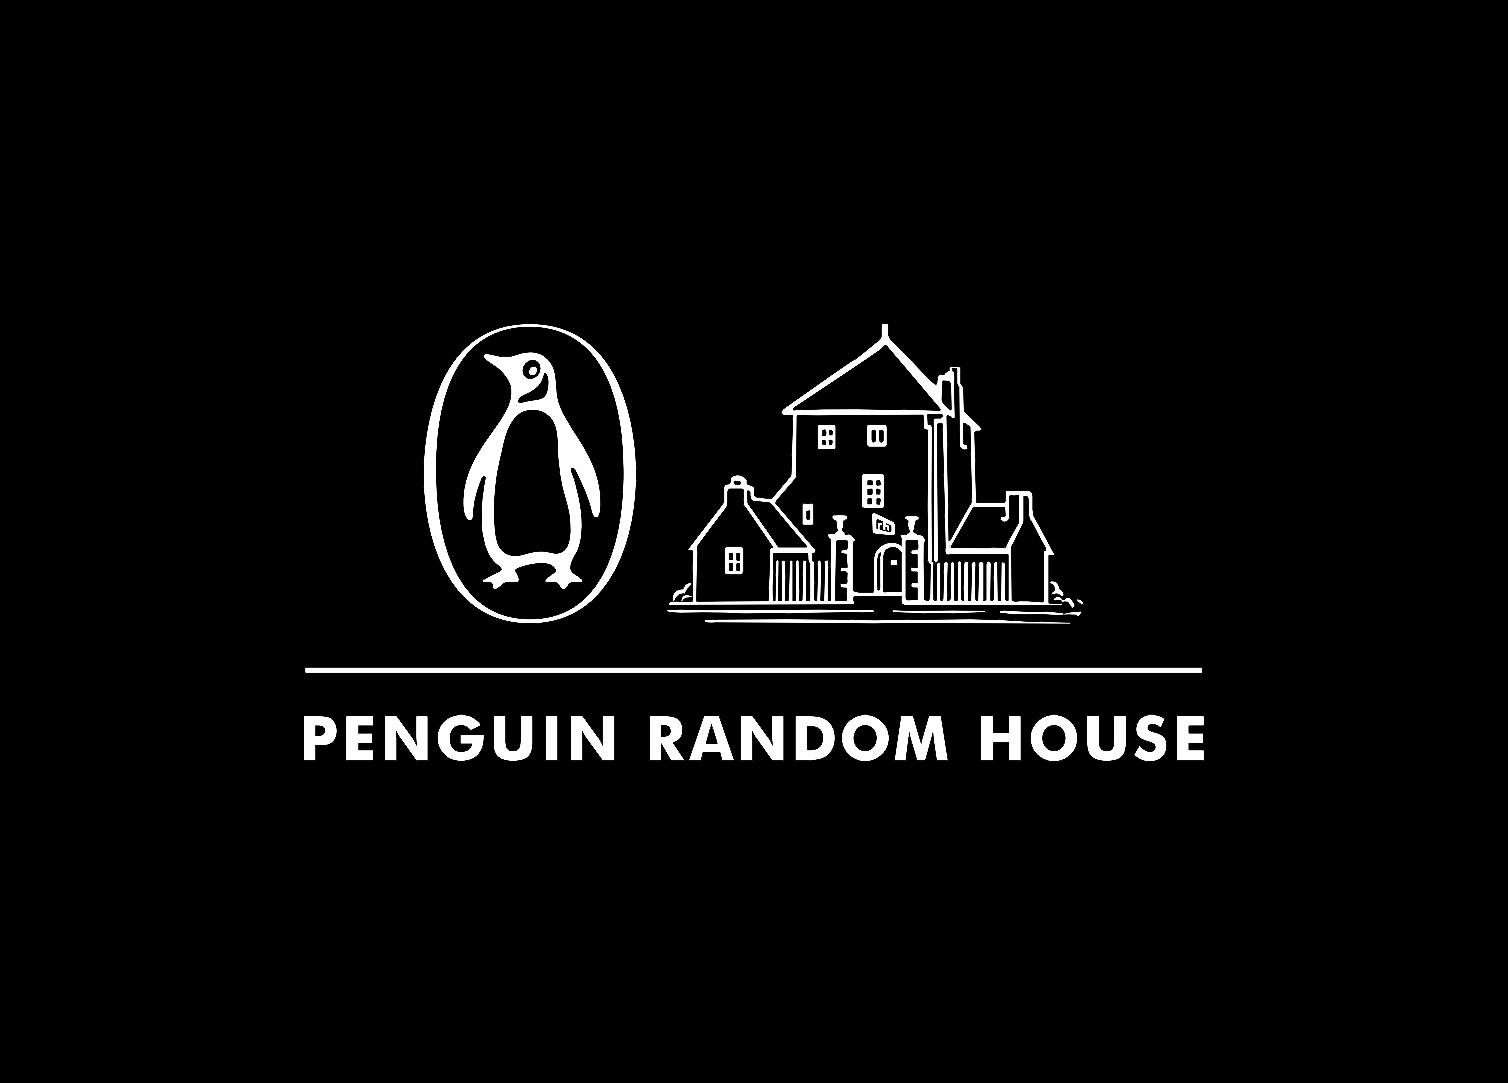 PenguinRandomHouse_TheSyndicate_Marketing.jpg